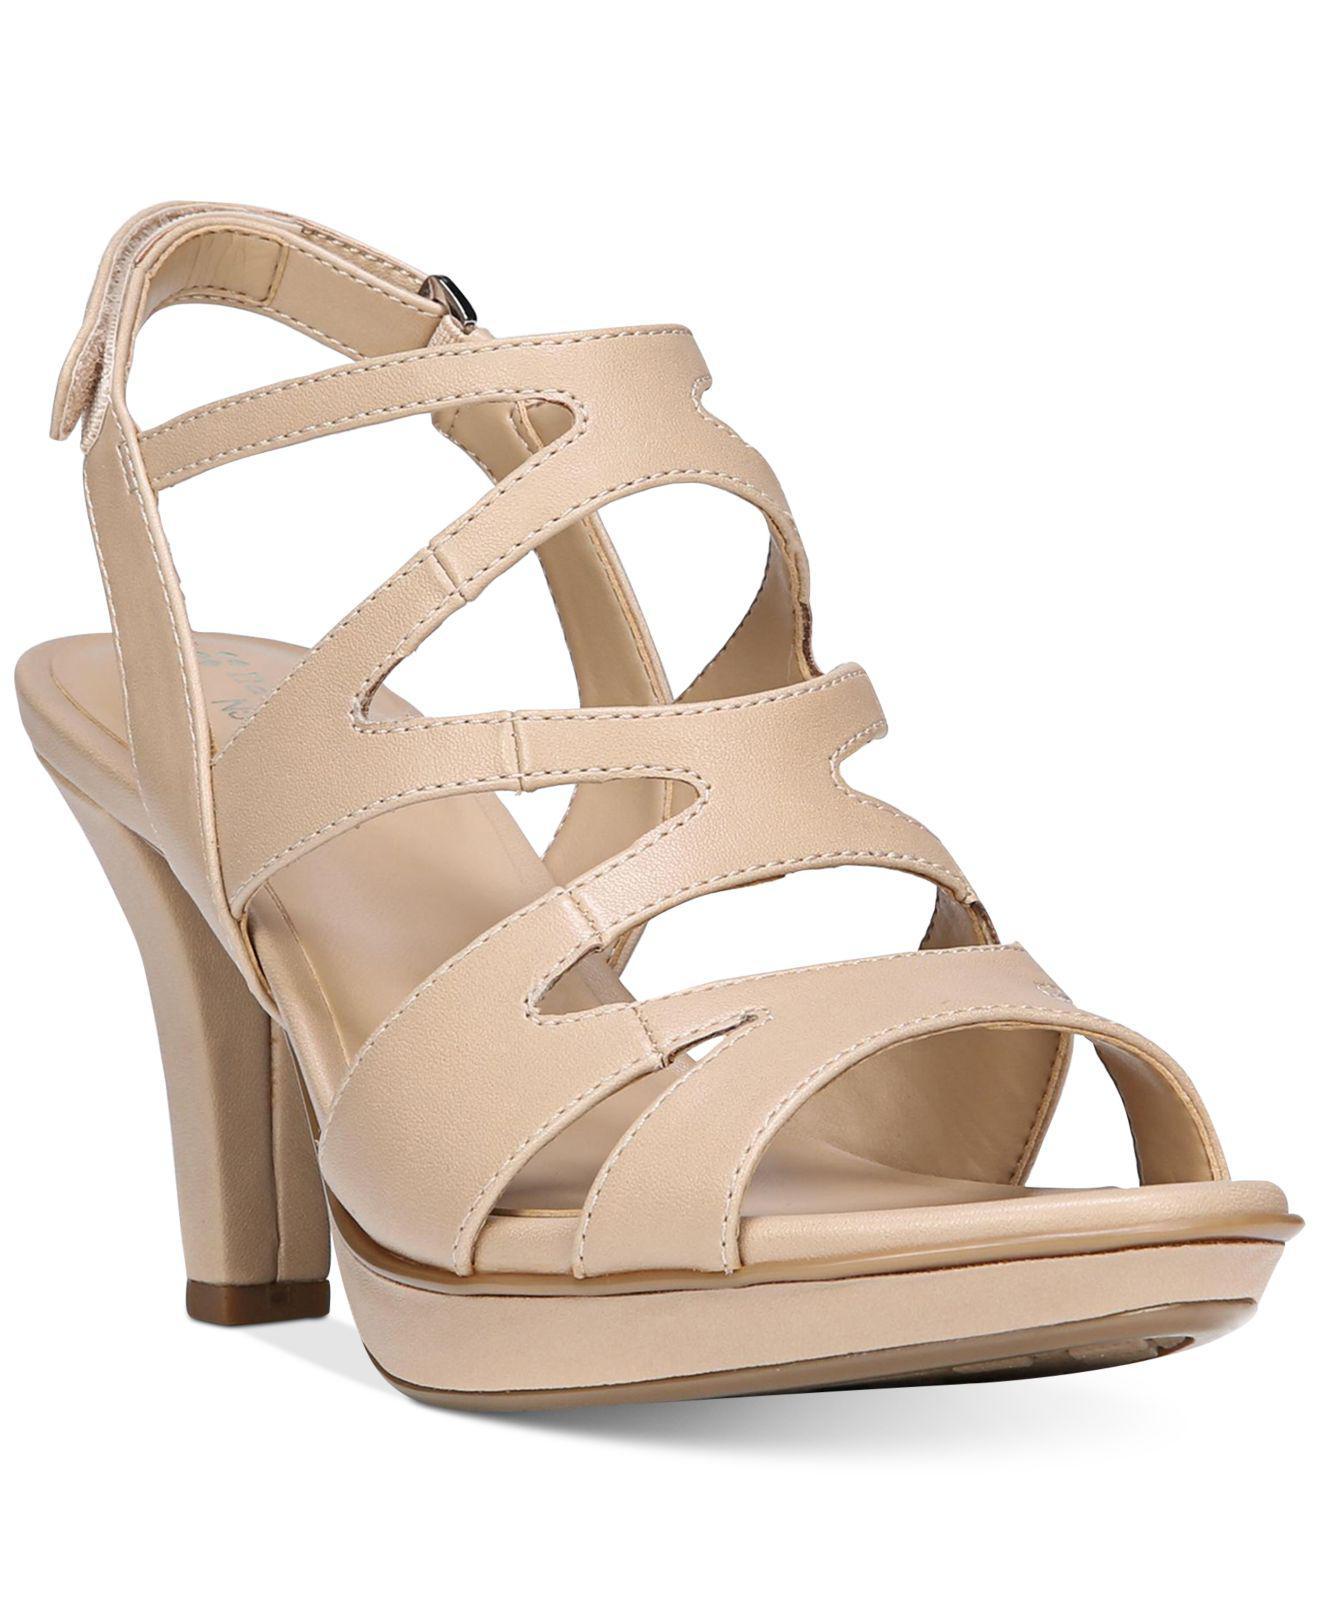 bdf8751553c Lyst - Naturalizer Dianna Slingback Sandals - Save 51%